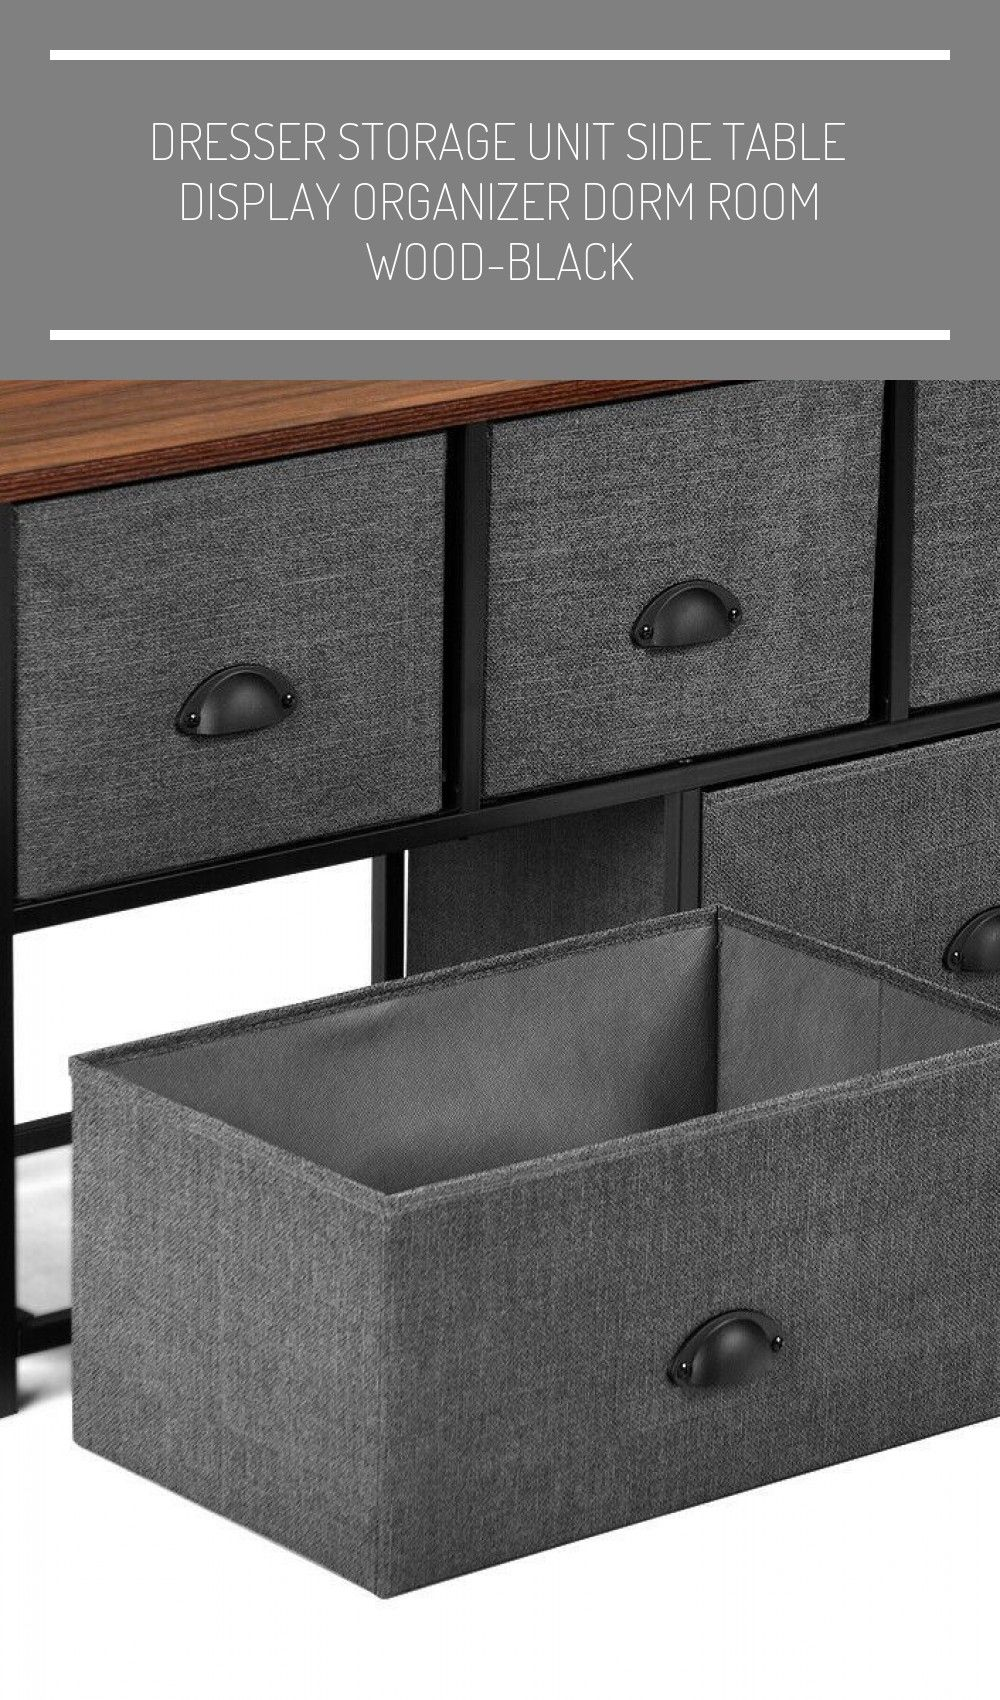 Dresser Storage Unit Side Table Display Organizer Dorm Room Wood Black Dorm Room Organization Dresser In 2020 Dorm Room Organization Dorm Organization Dresser Storage